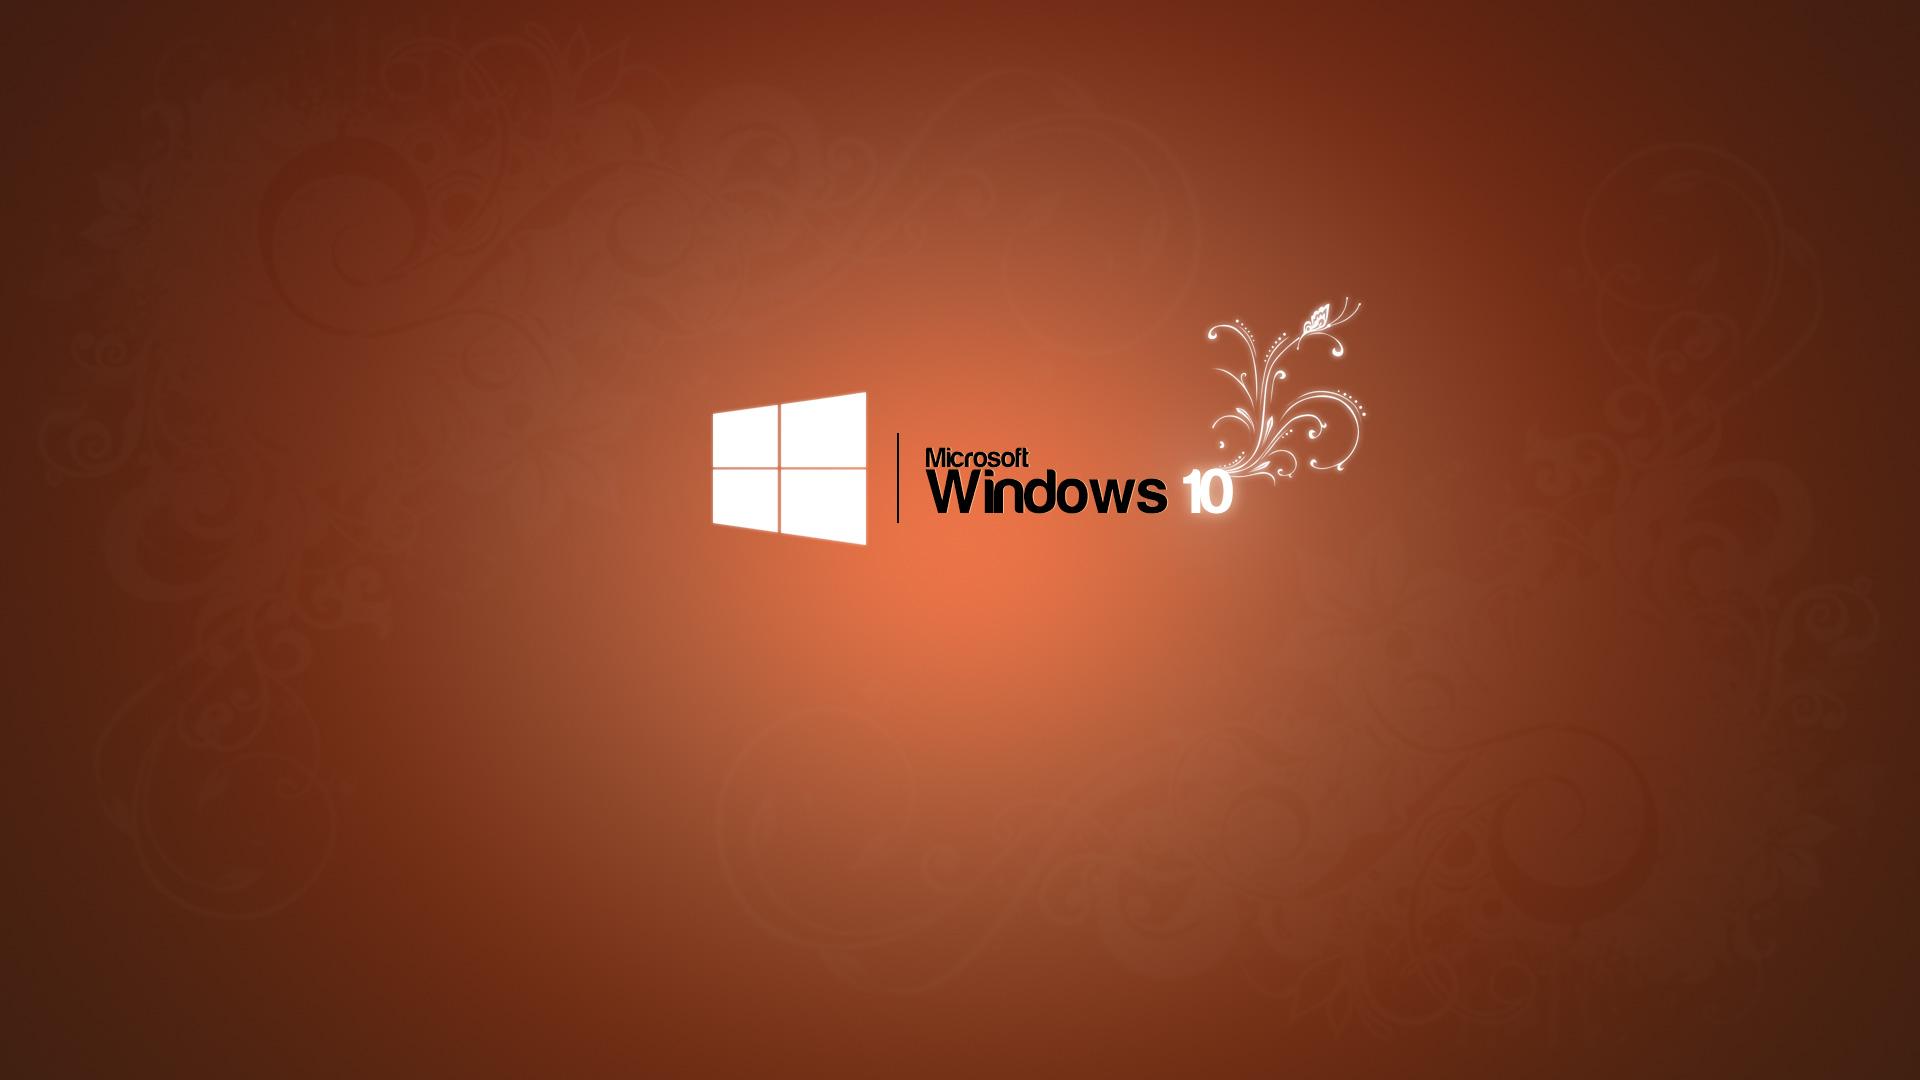 Free Download Wallpapers Windows 10 1920x1080 Wallpaper